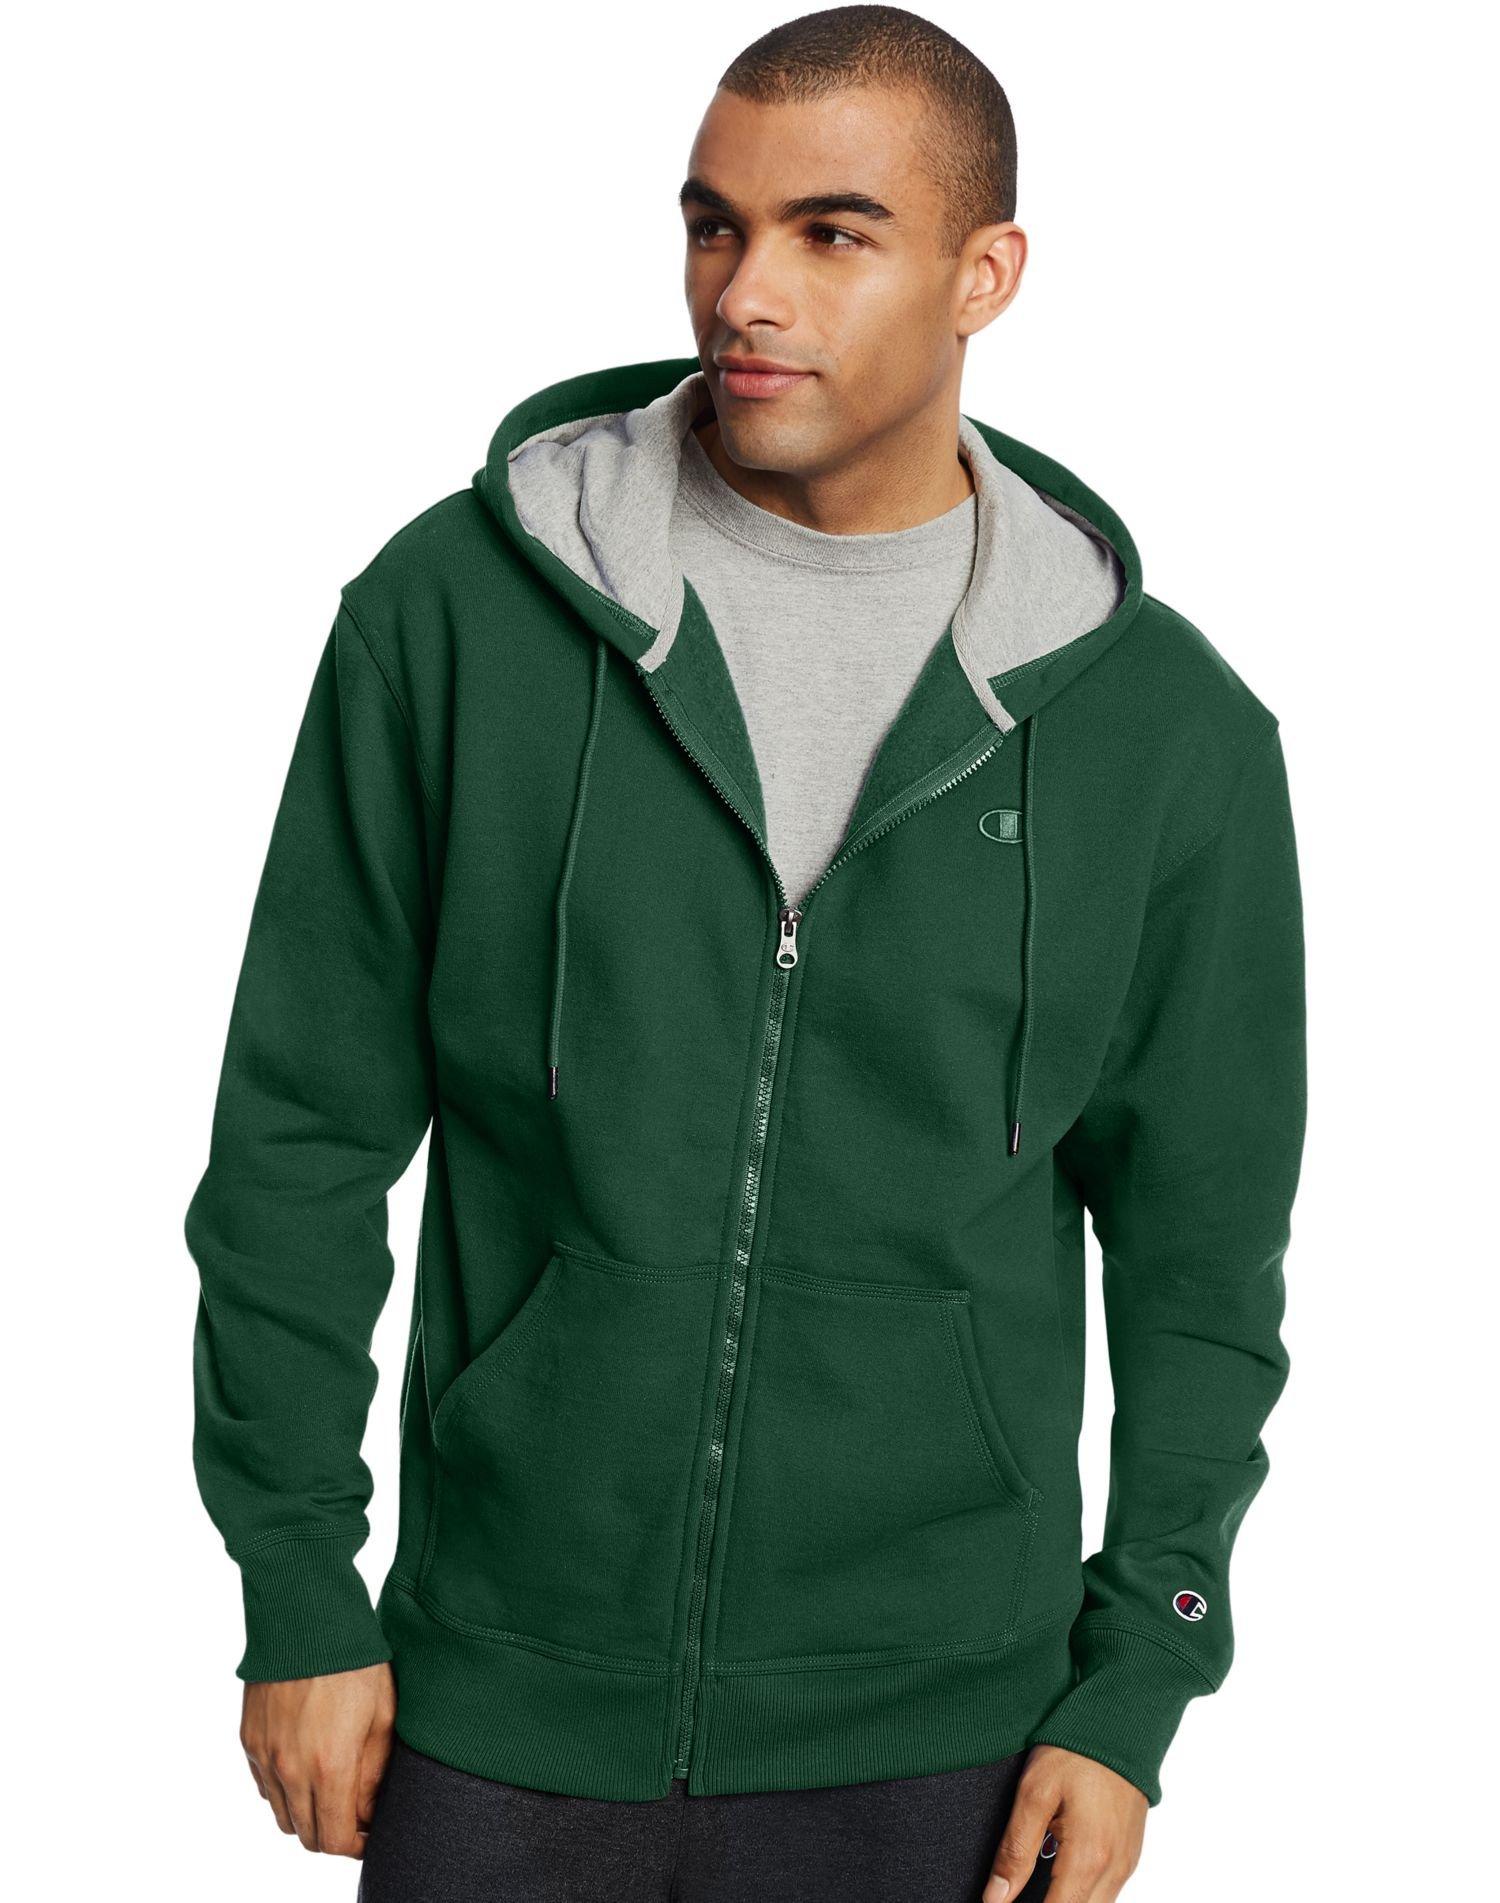 Champion Mens Powerblend Fleece Full Zip Jacket, 3XL, Dark Green by Champion